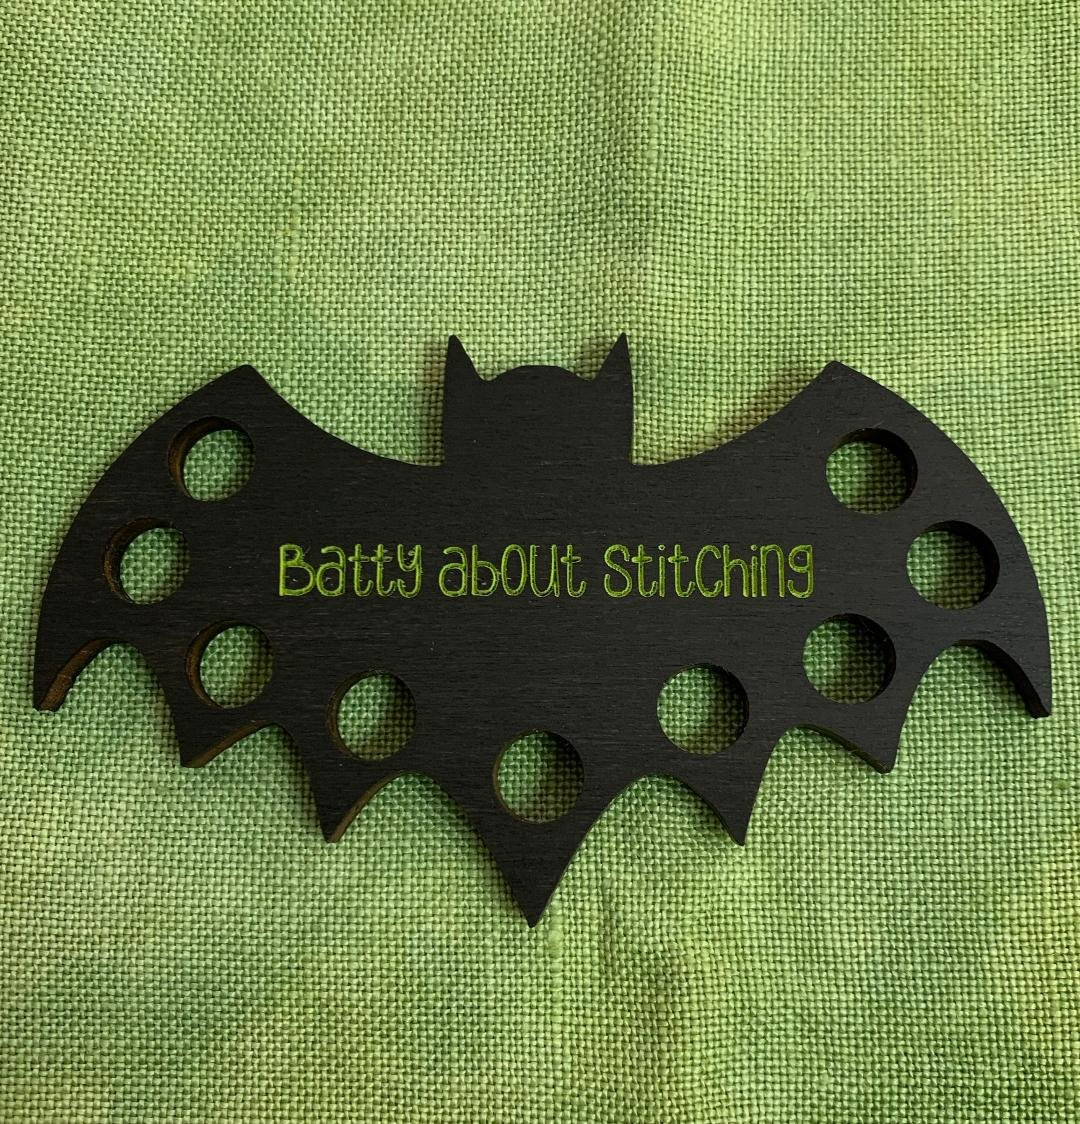 Batty About Stitching Thread Keep